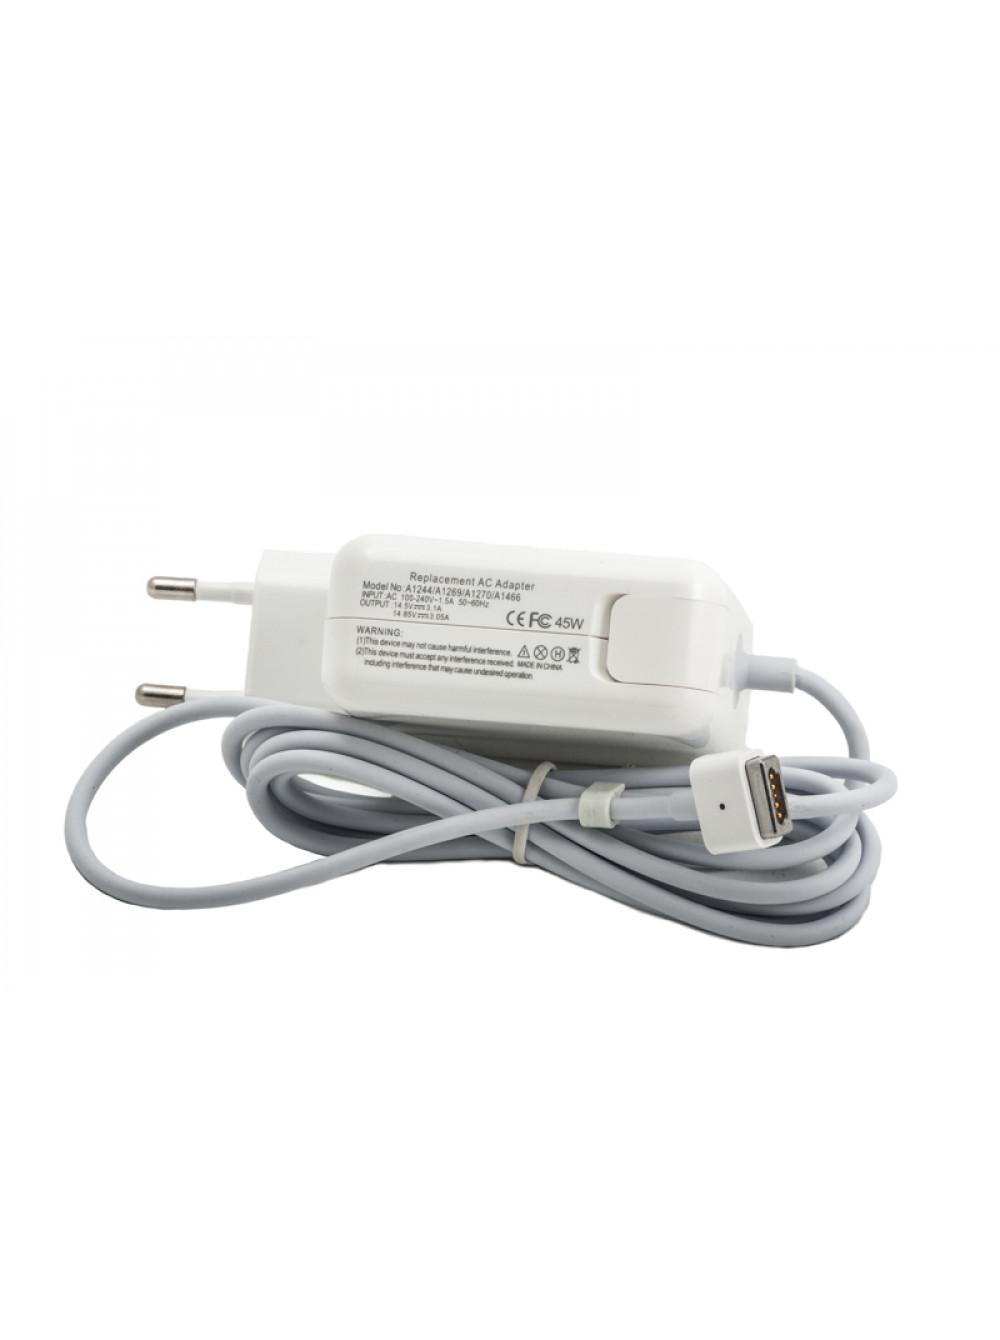 Зарядное устройство для Apple Macbook PowerPlant 220V, 14.5V 45W 3.1A (Magnet tip)